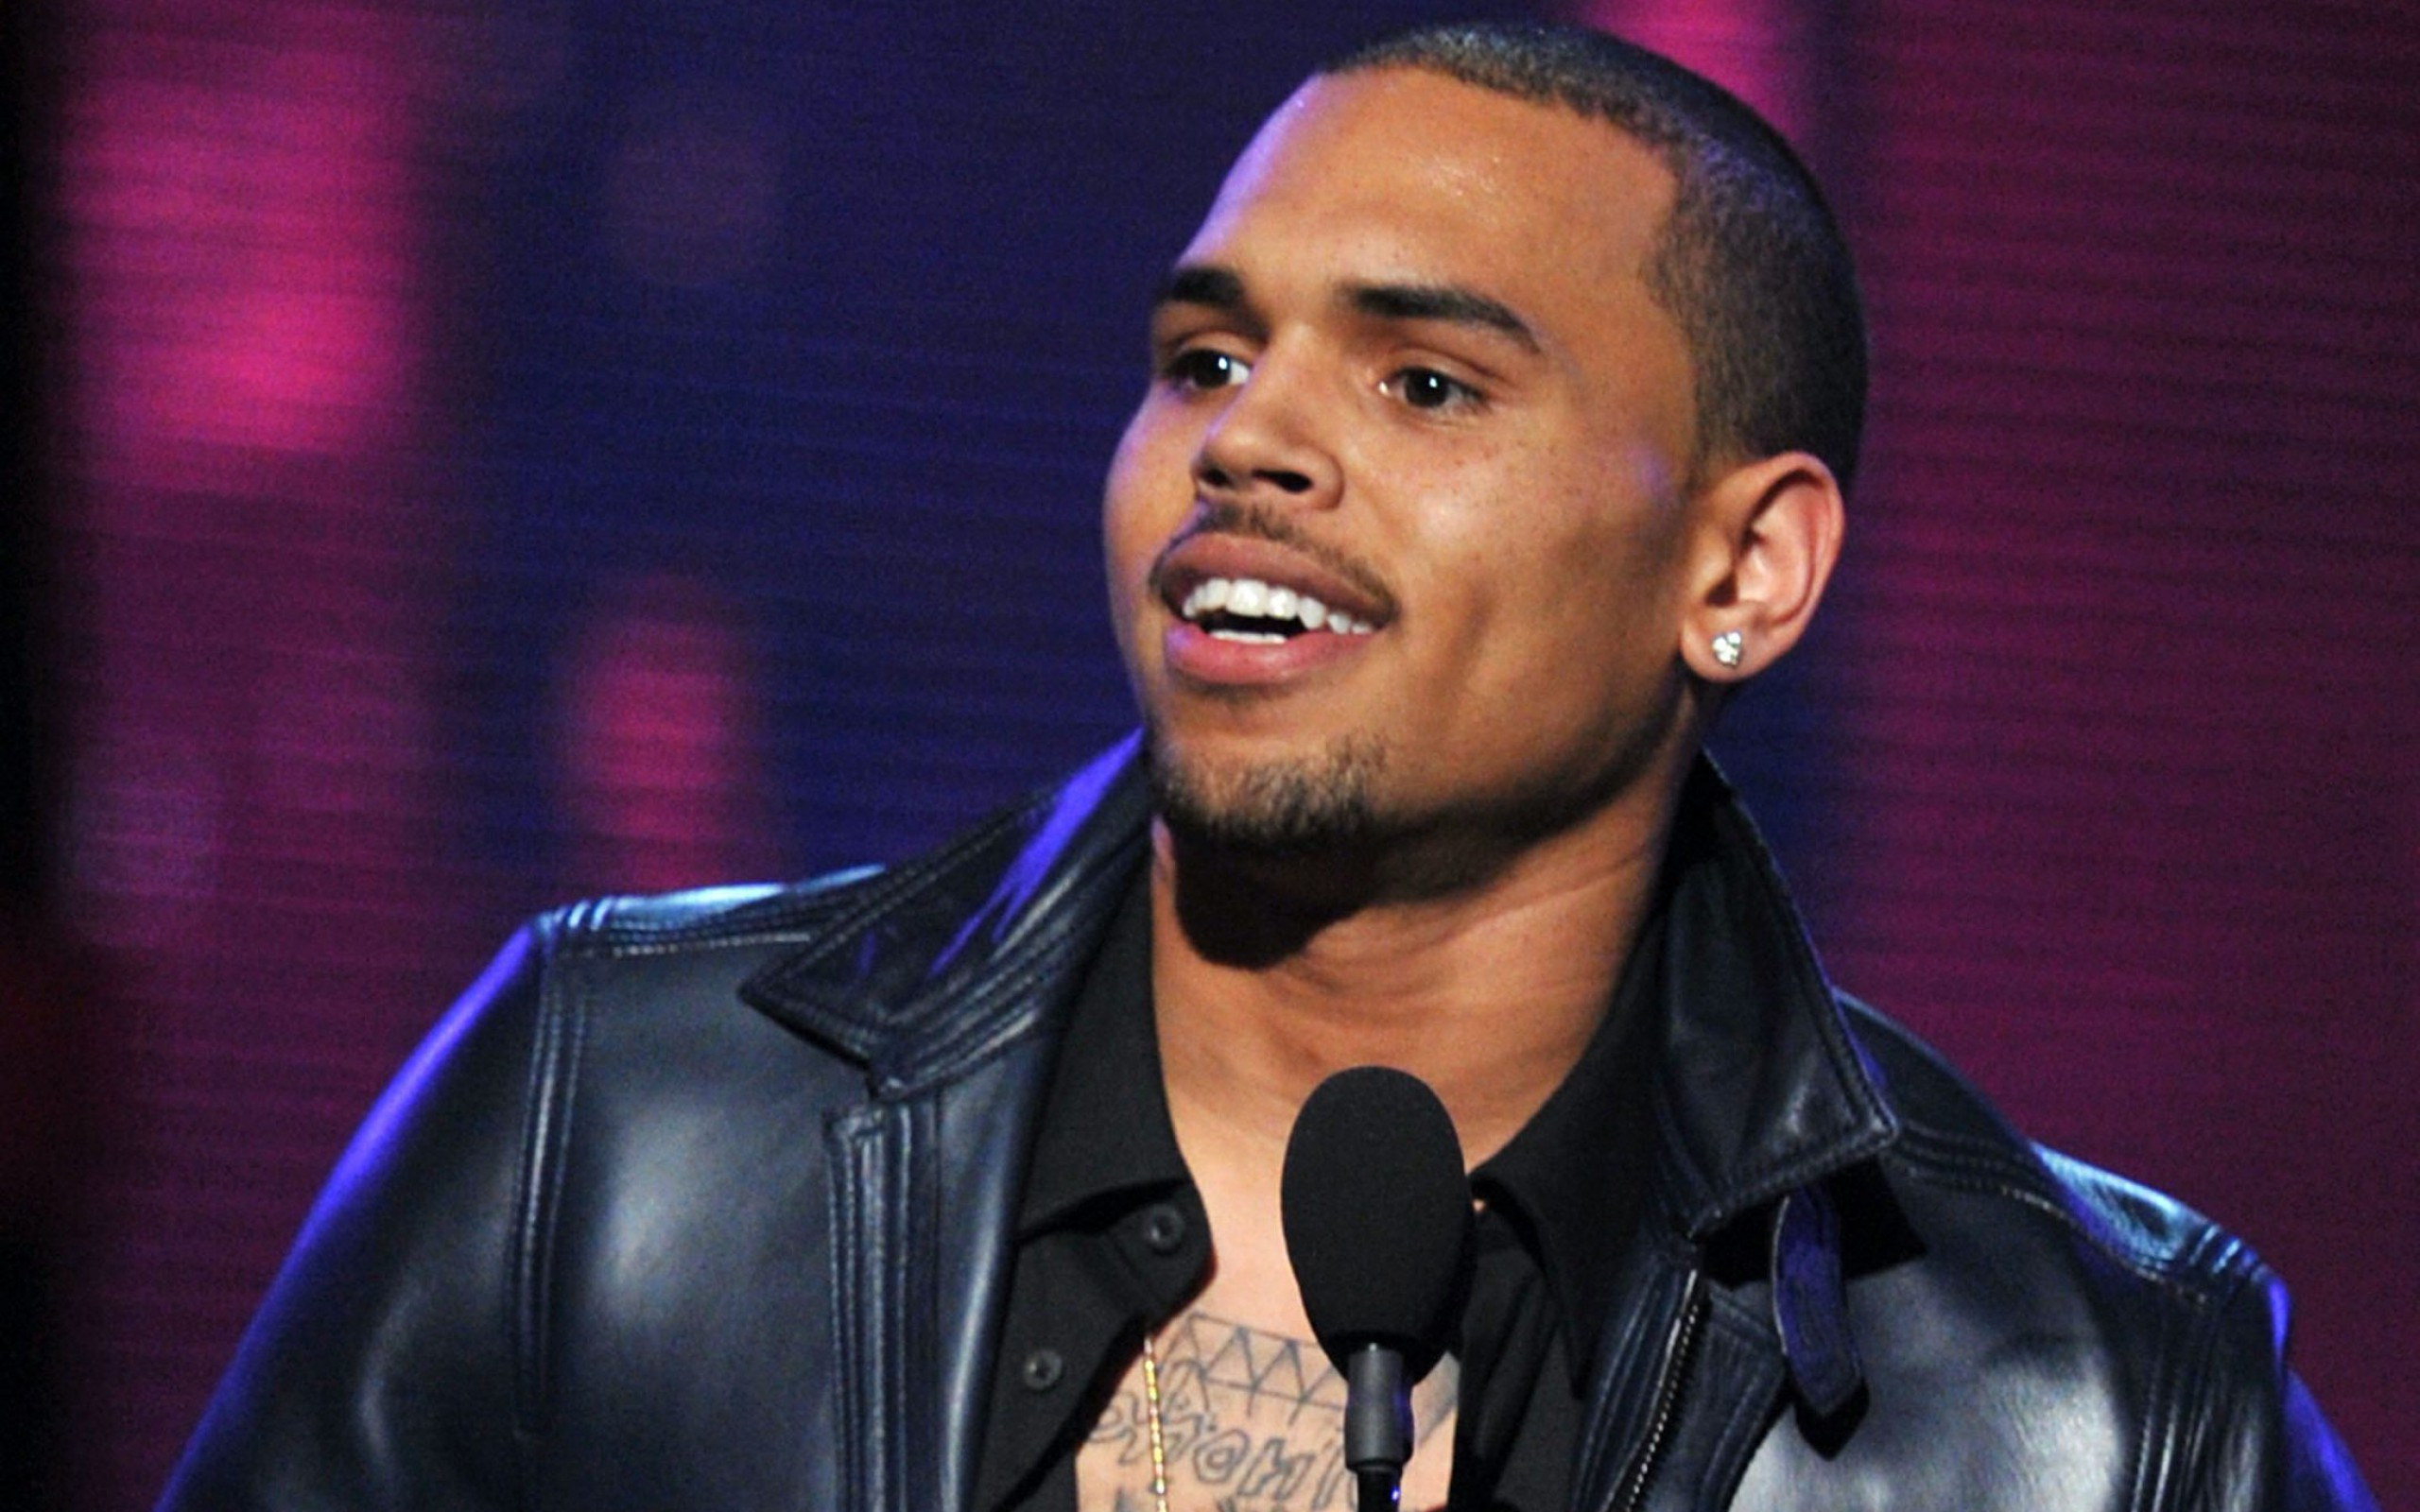 Chris Brown HD Wallpapers | Hd Wallpapers